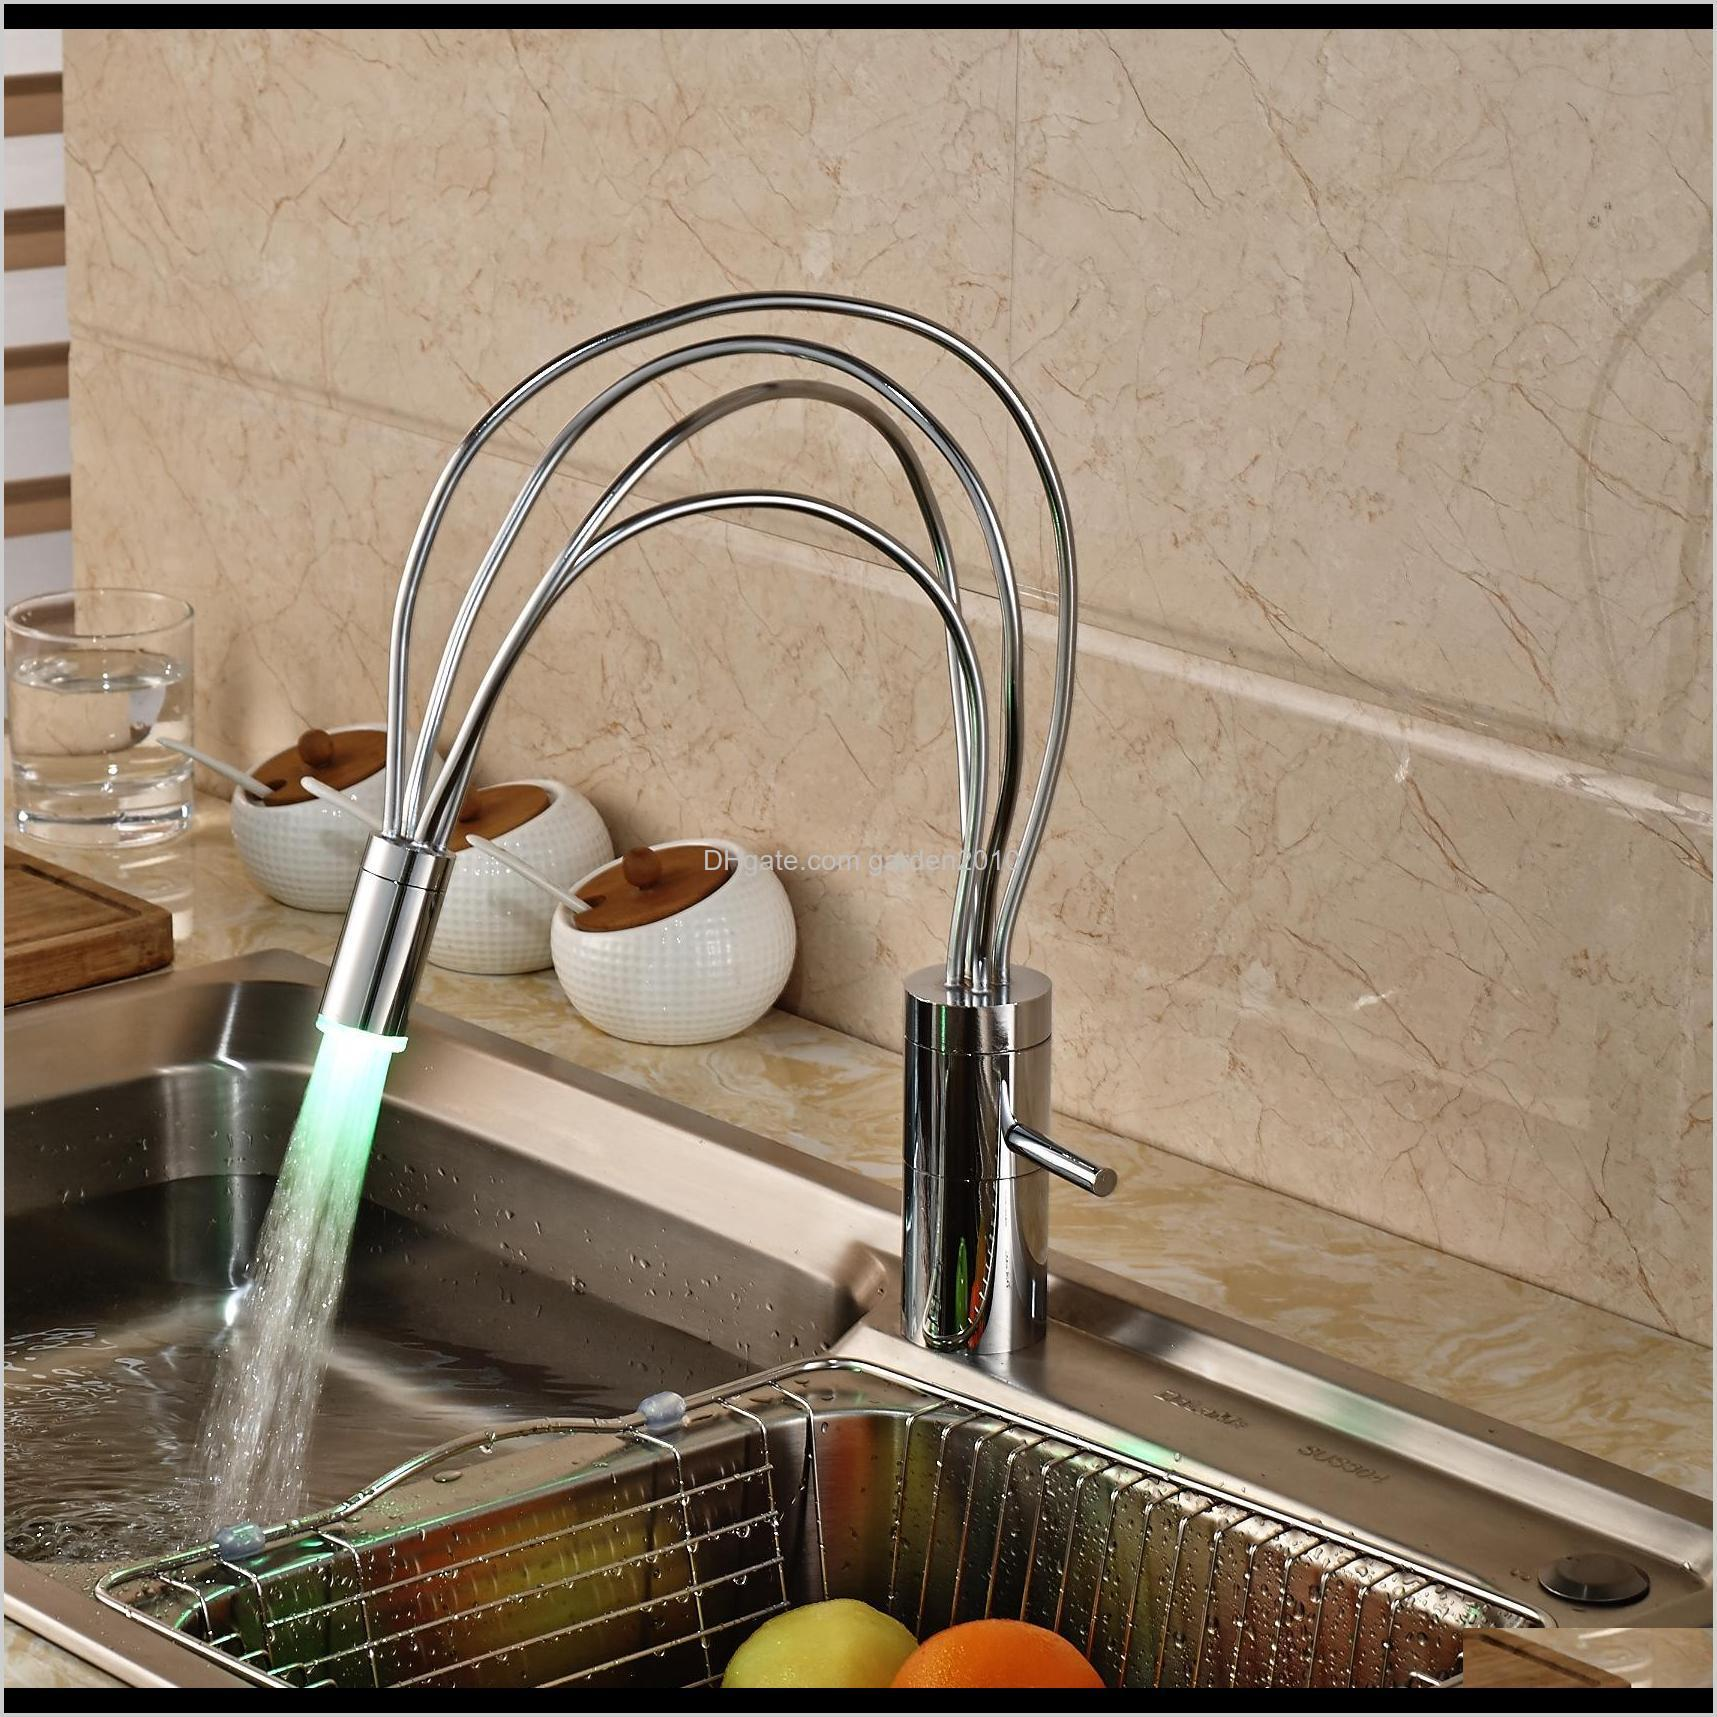 Faucets Led Color Changing Chrome Brass Kitchen Faucet Vantiy Sink Mixer Tap Single Handle Hole 2He8R Pkfal